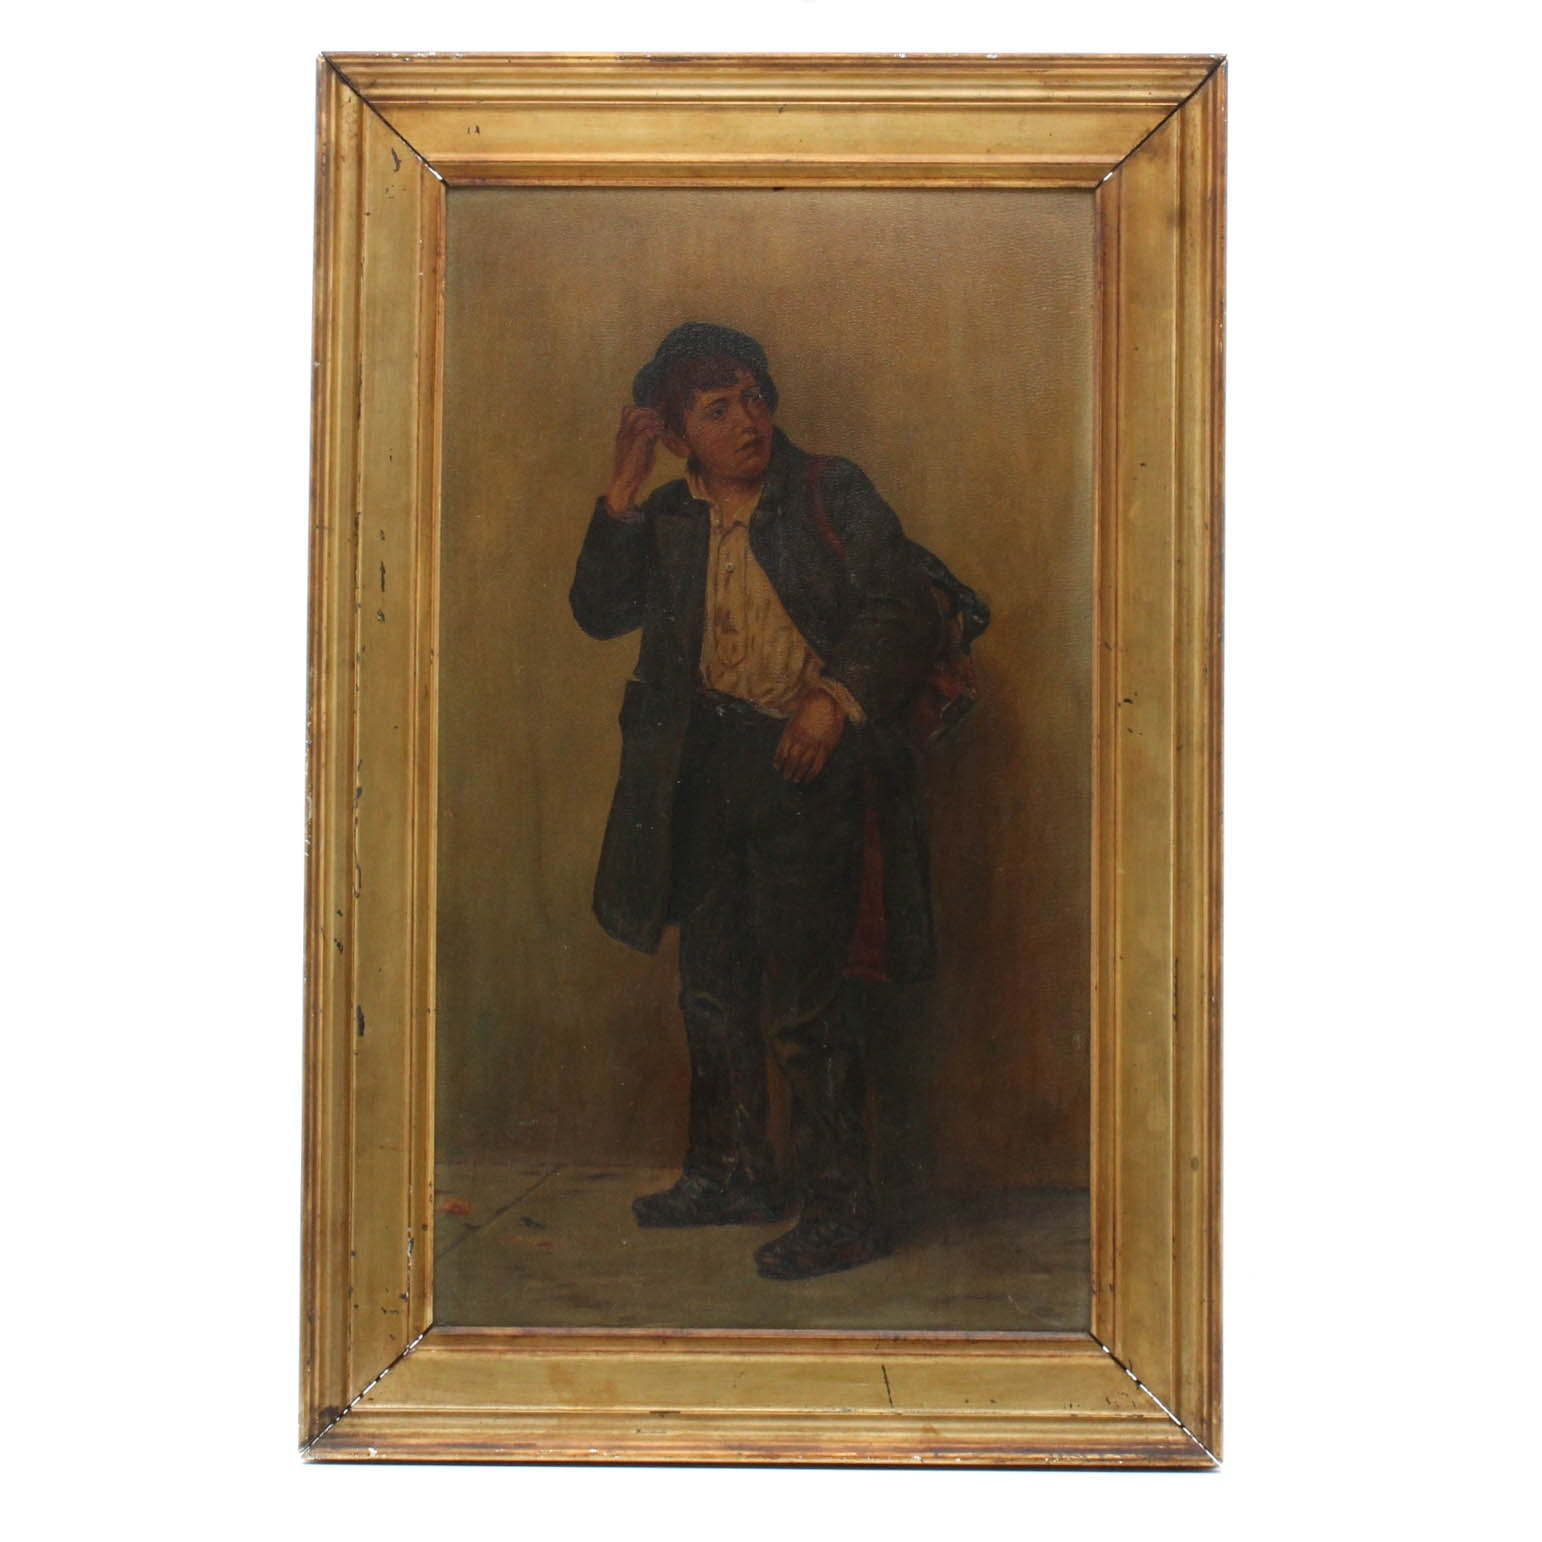 Antique Continental Dodger Boy Oil Painting